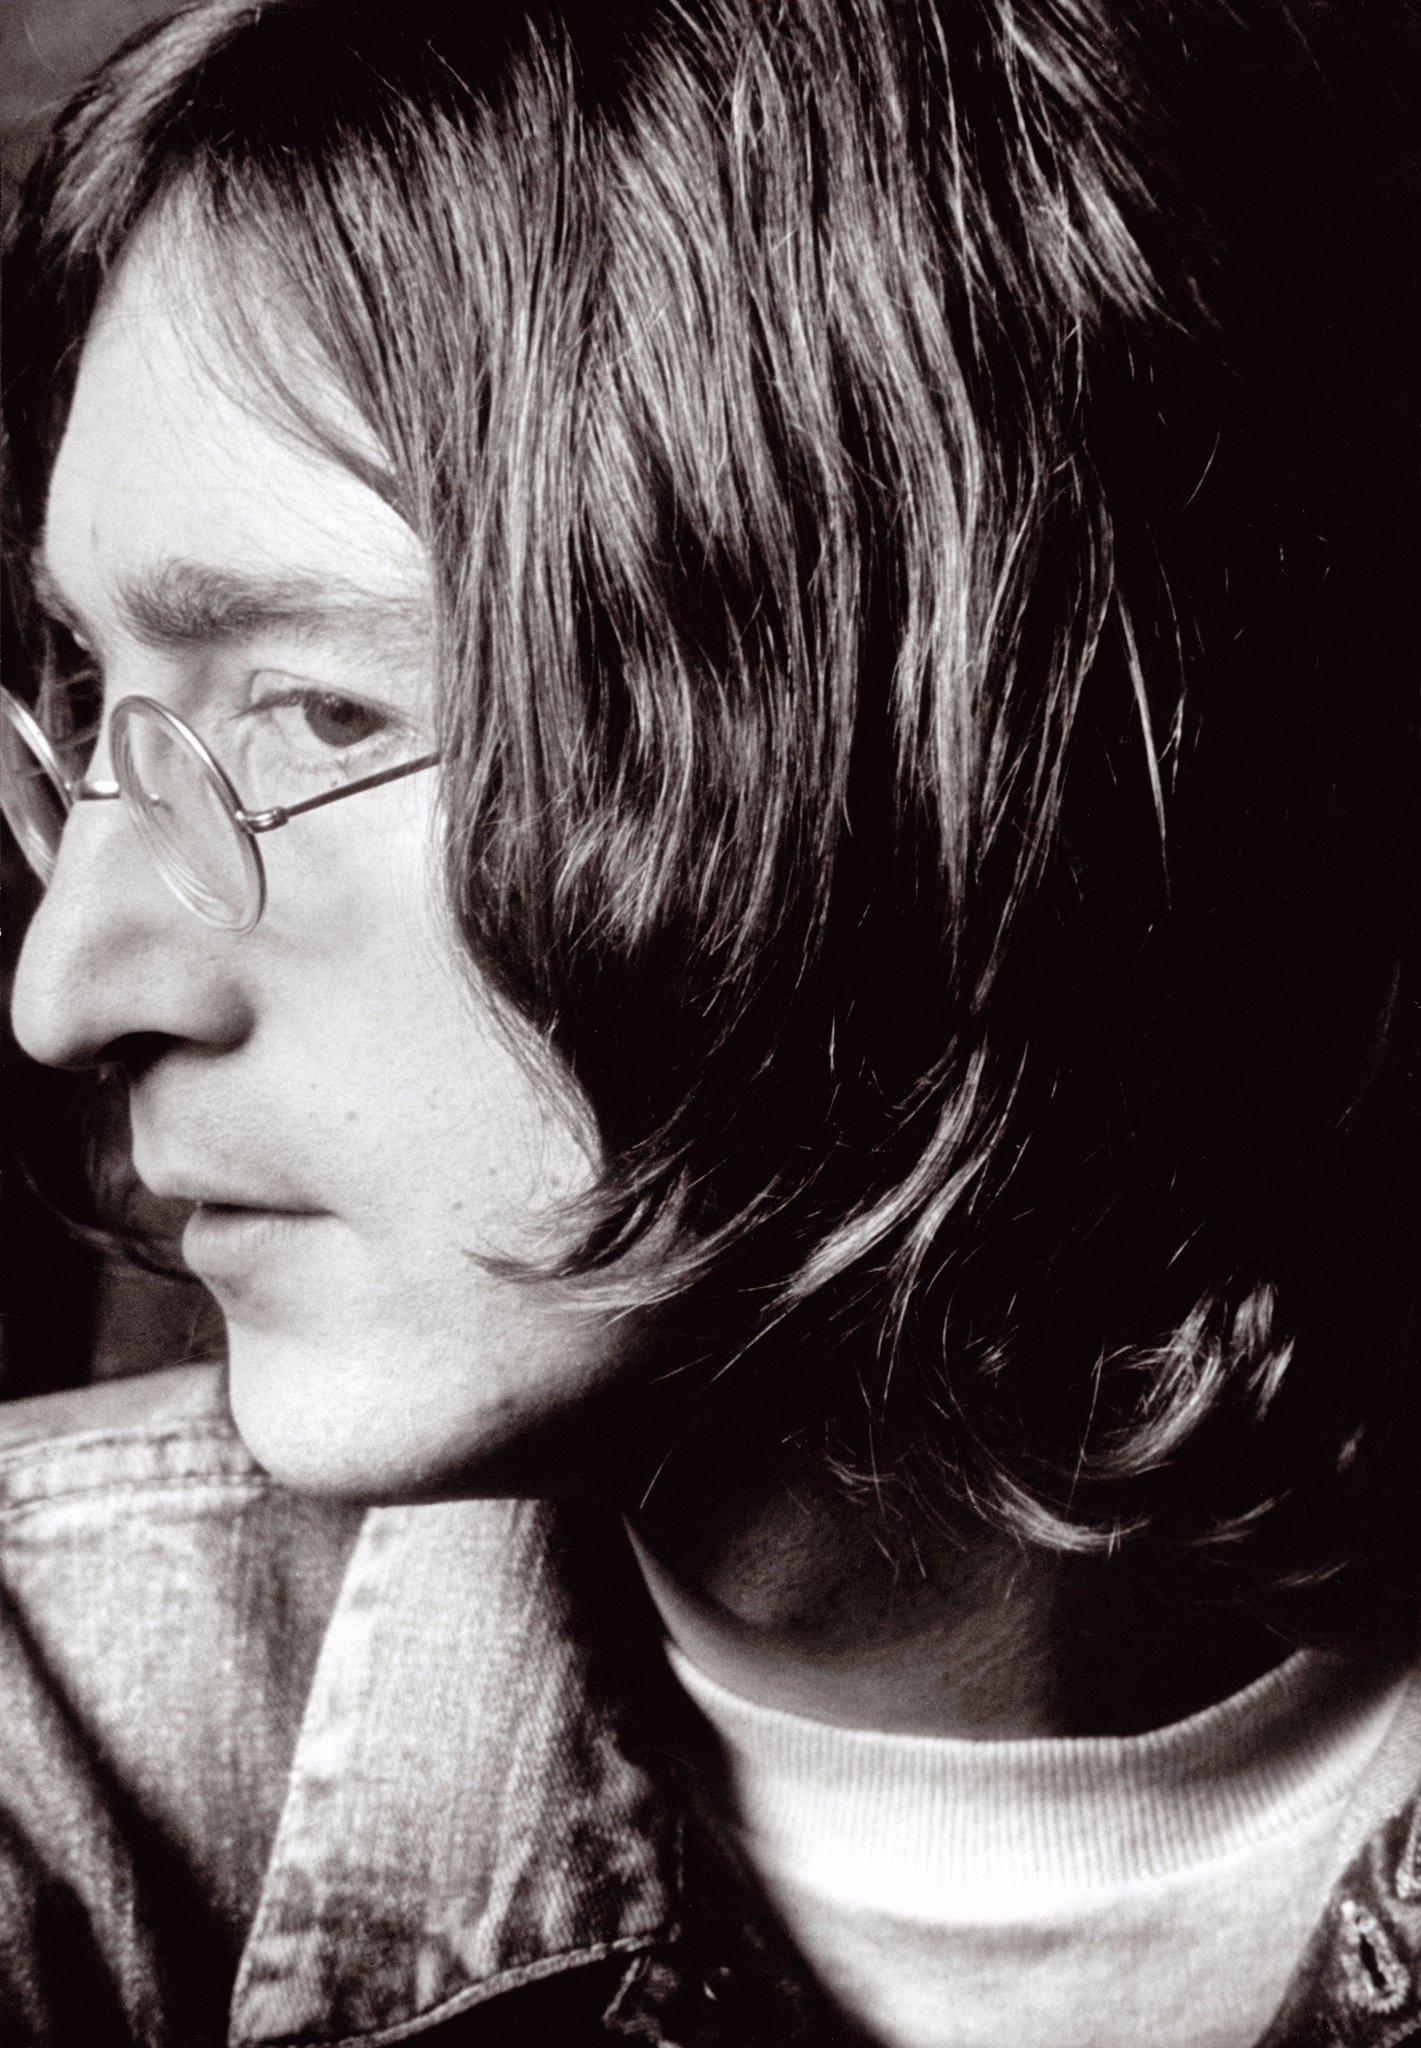 Happy Birthday, John. https://t.co/w47g796EkE